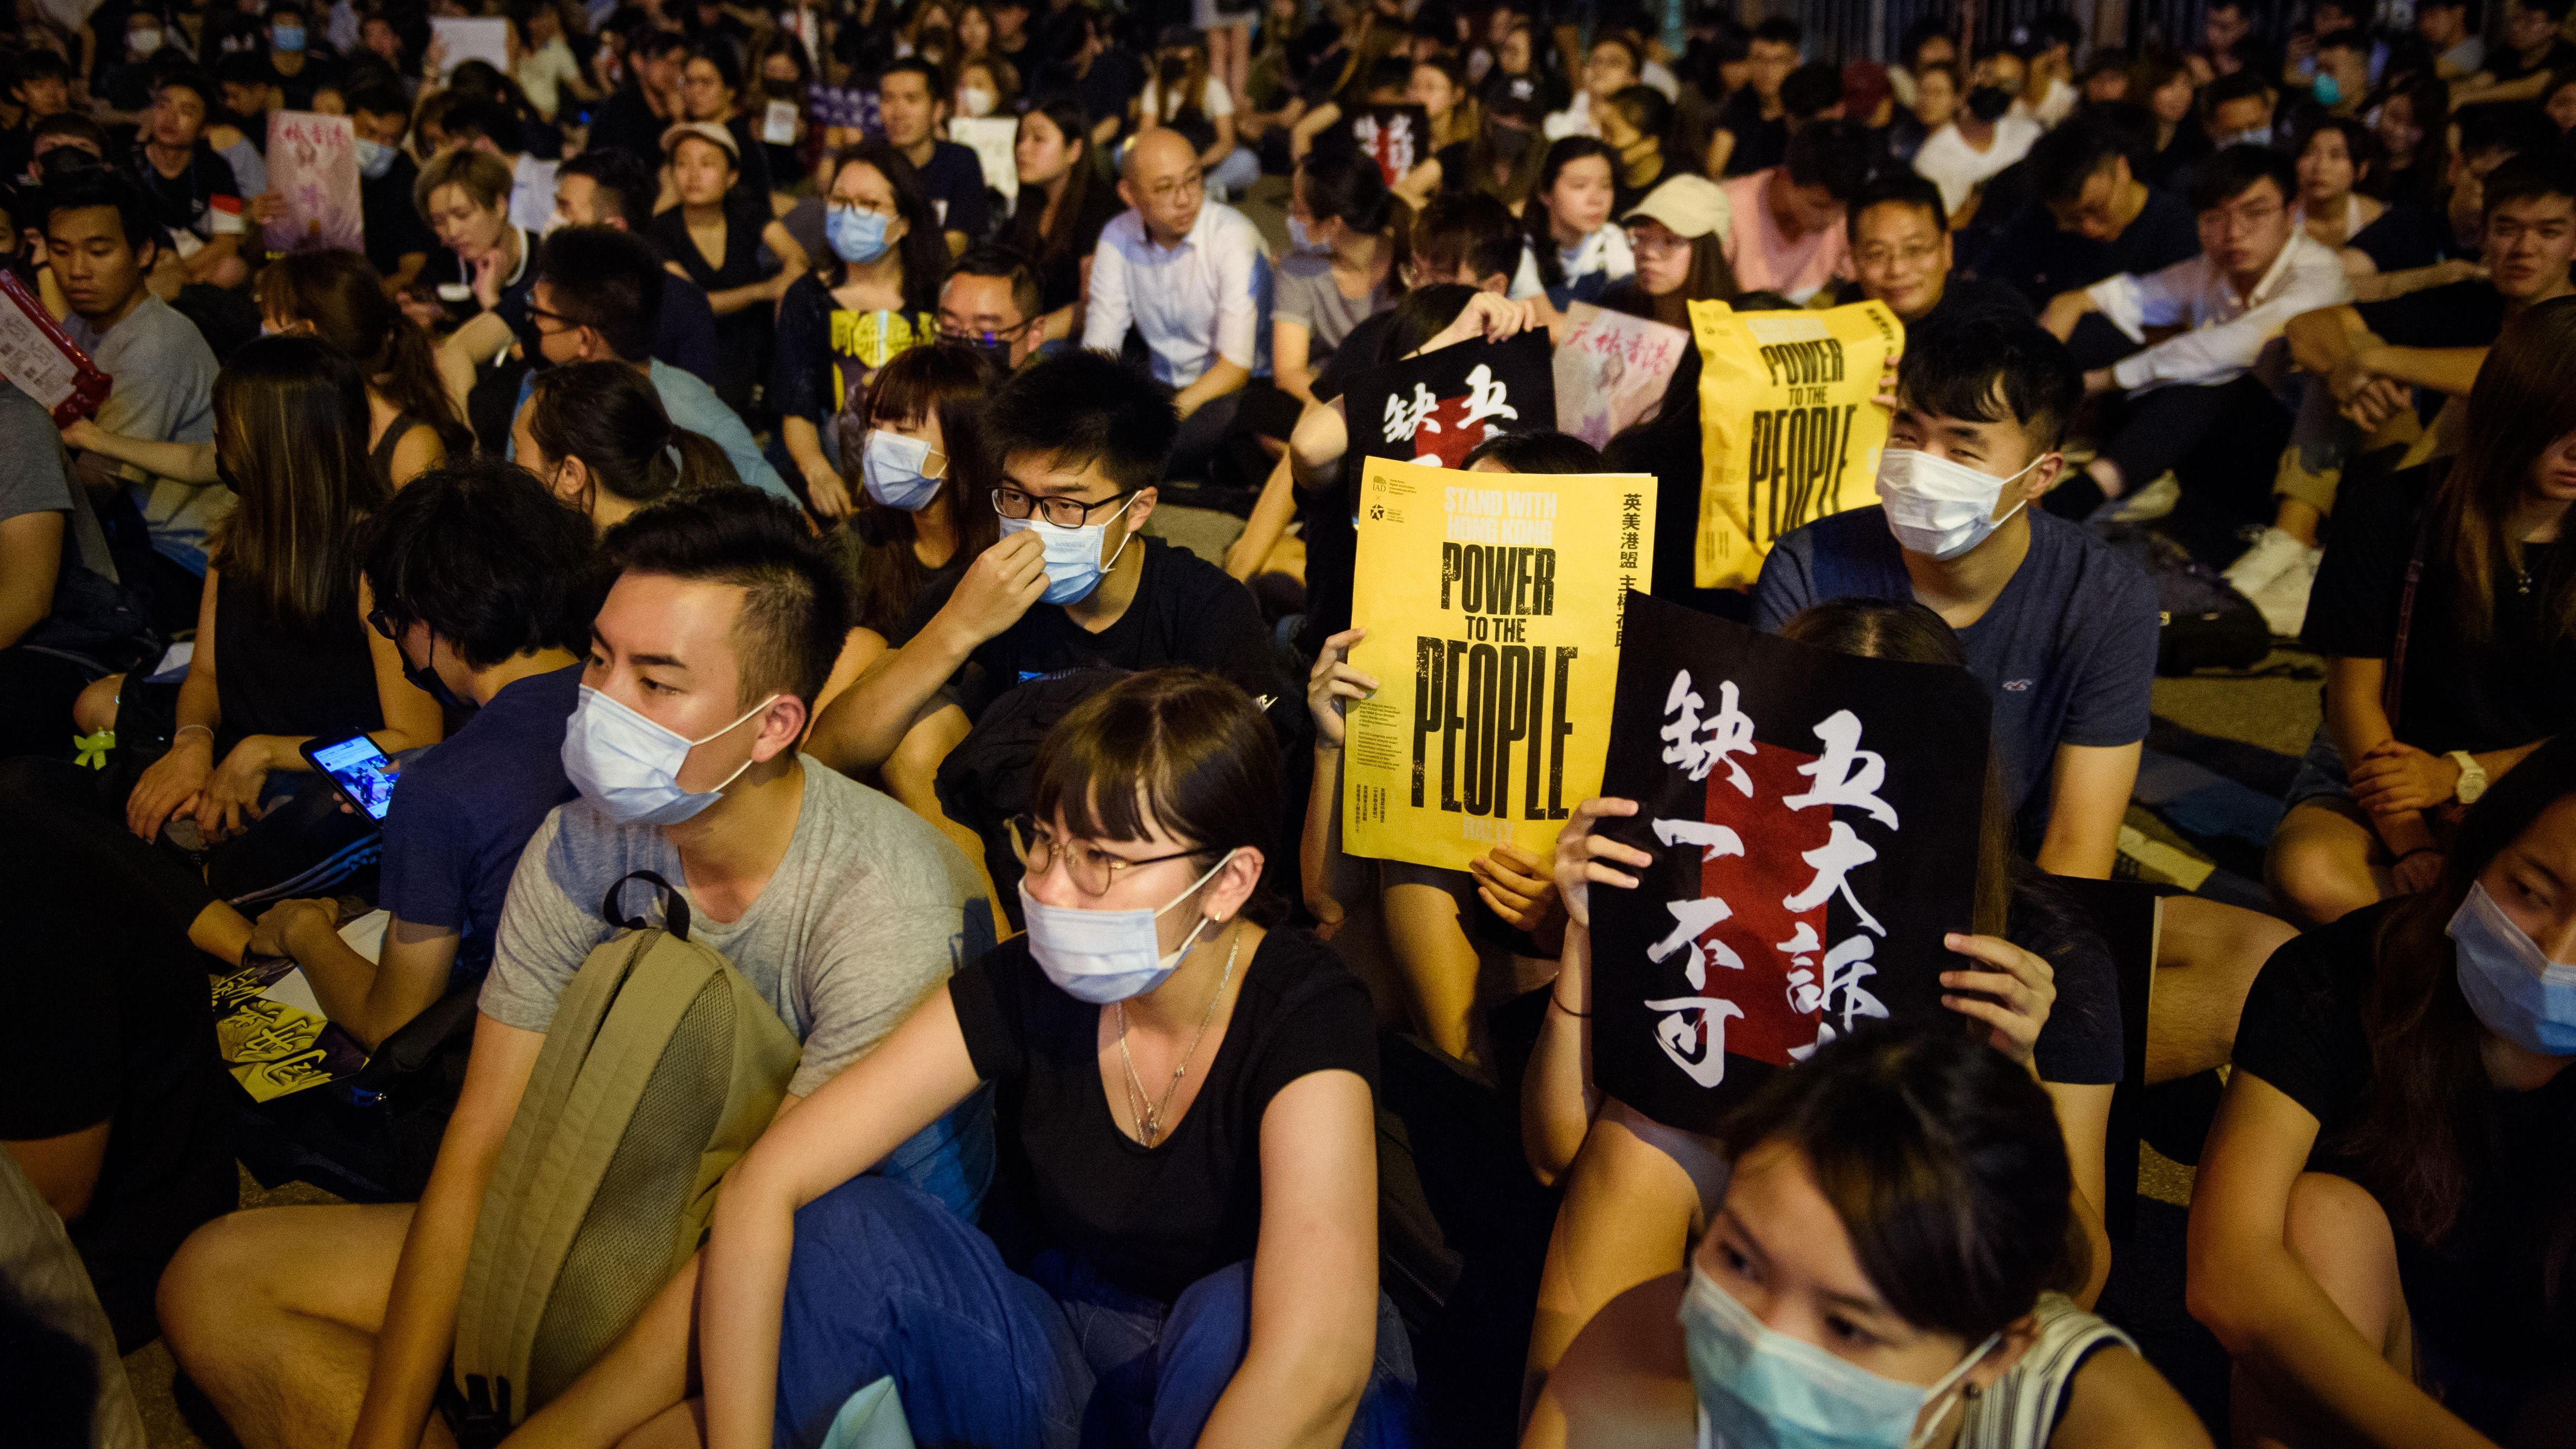 Protestkundgebung in Hongkong